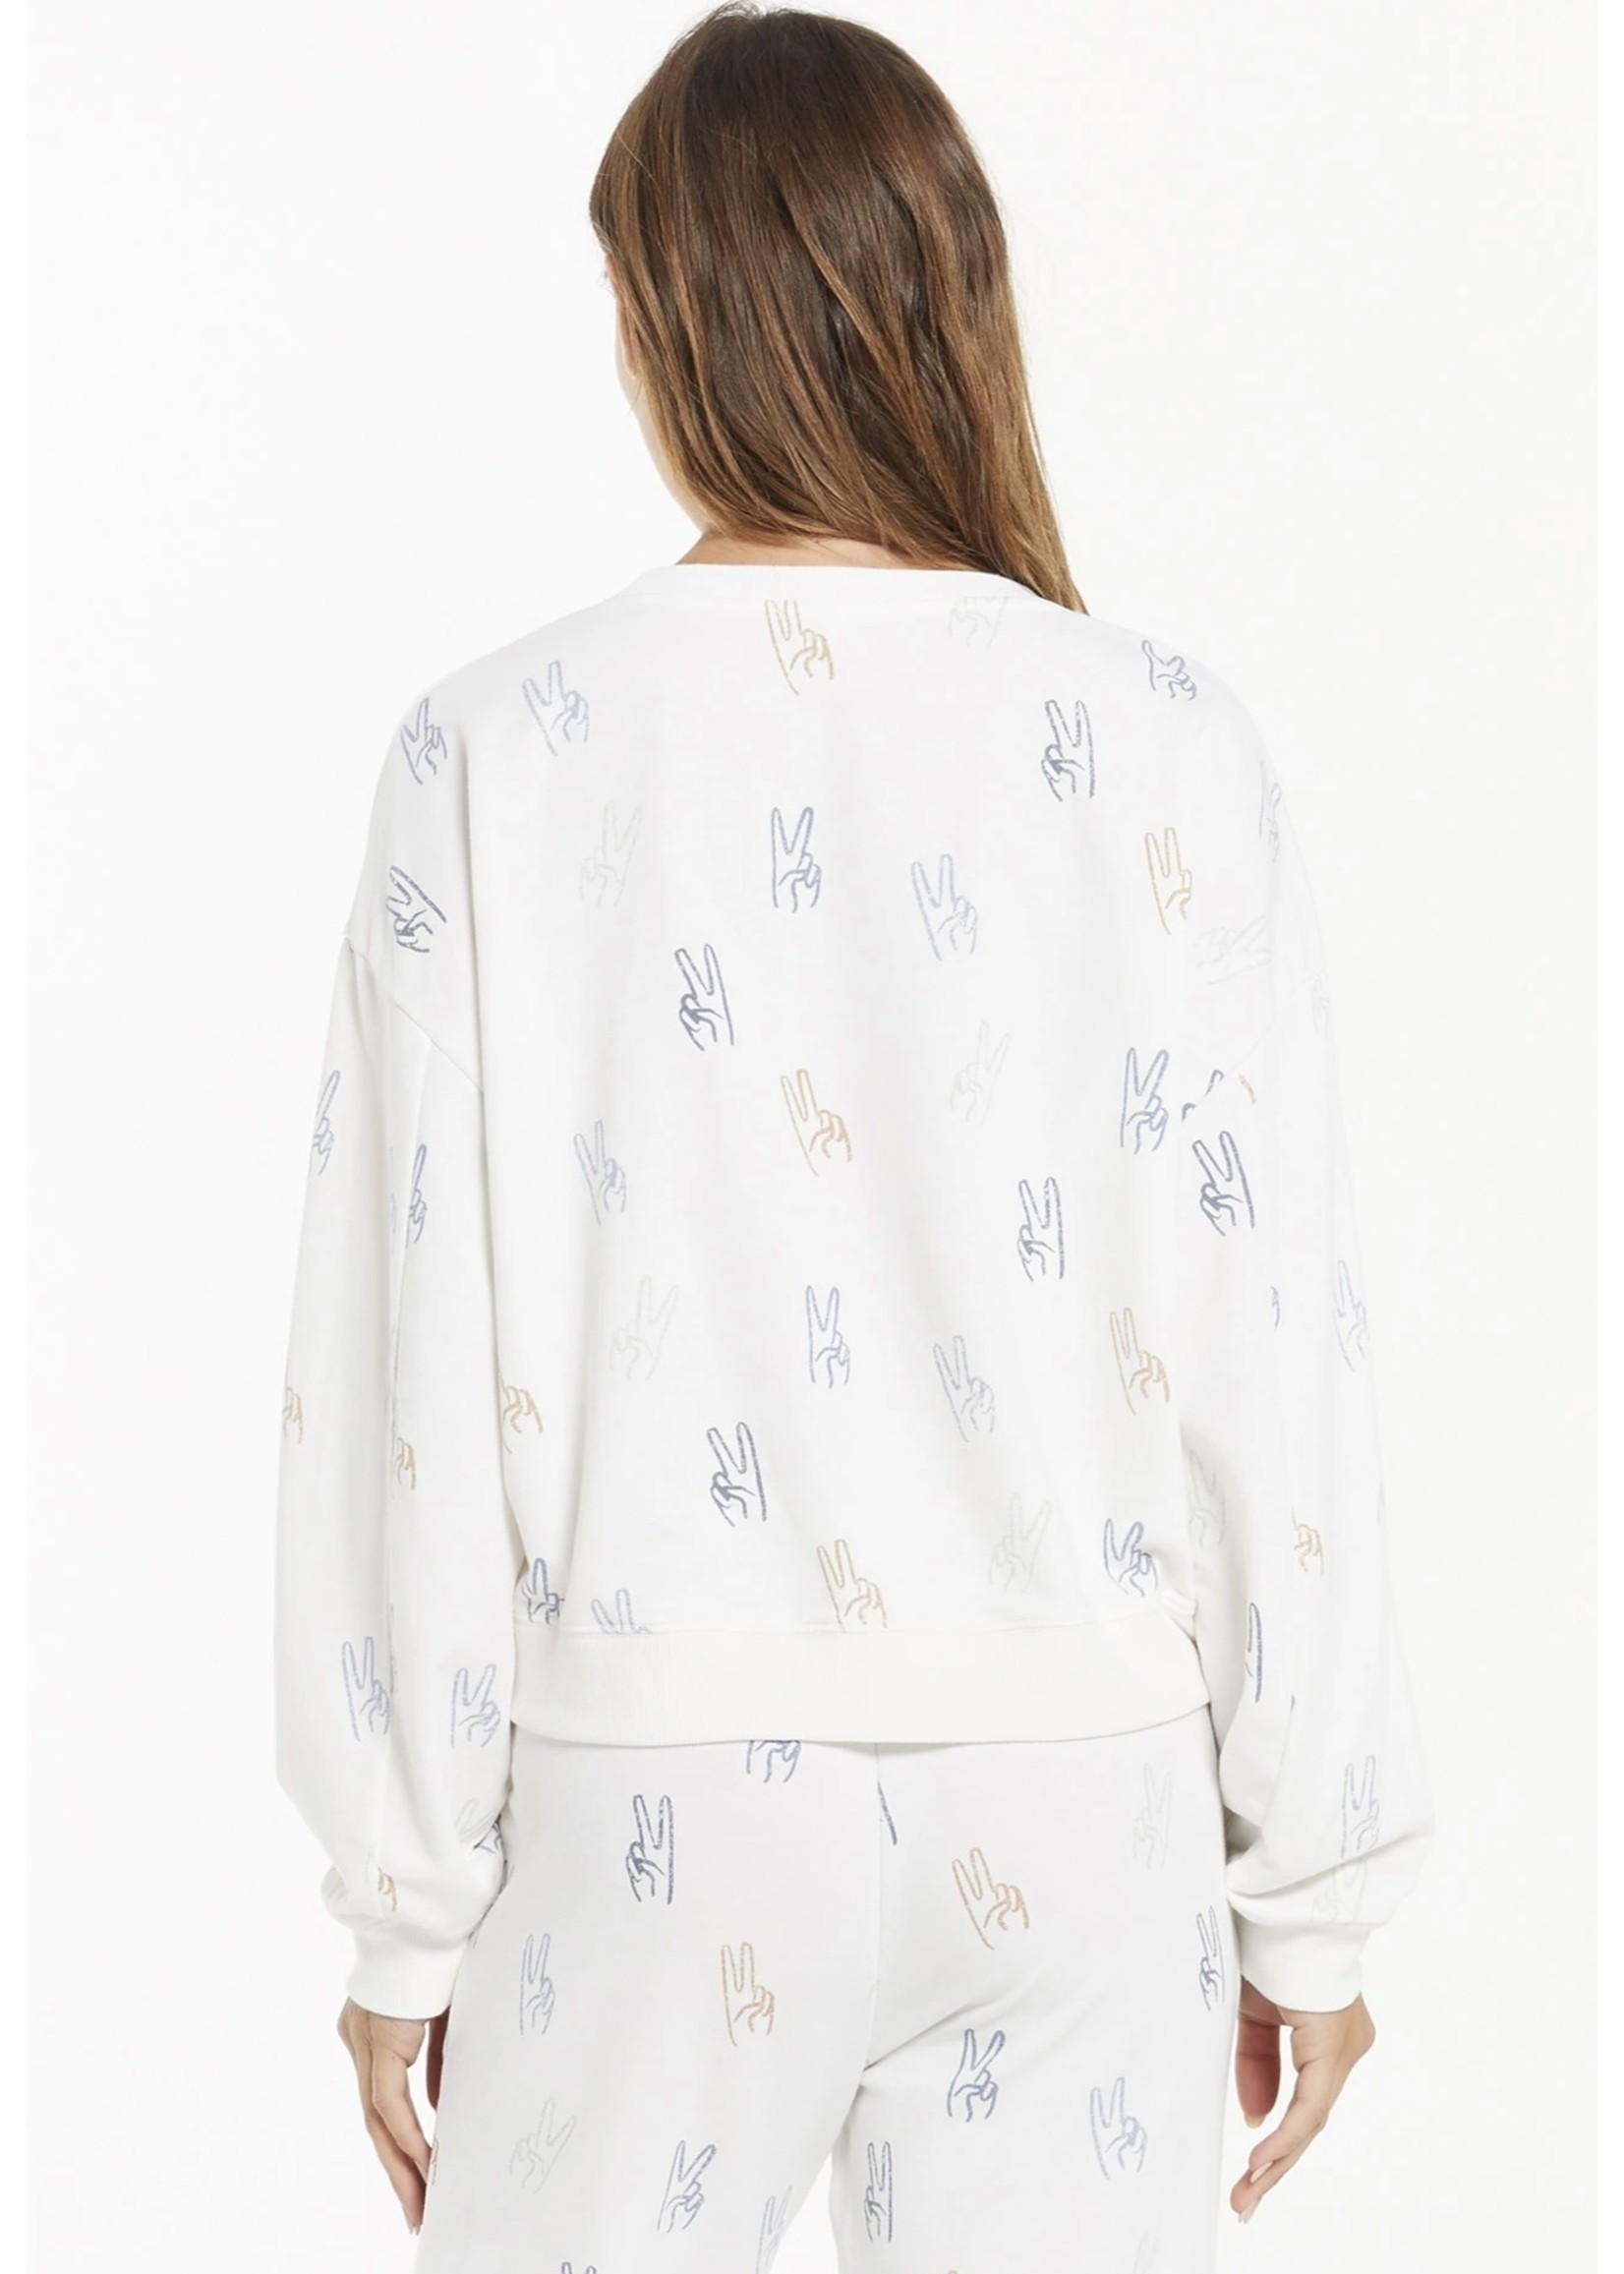 Z Supply Noa Make Peace Sweatshirt - ZT213804